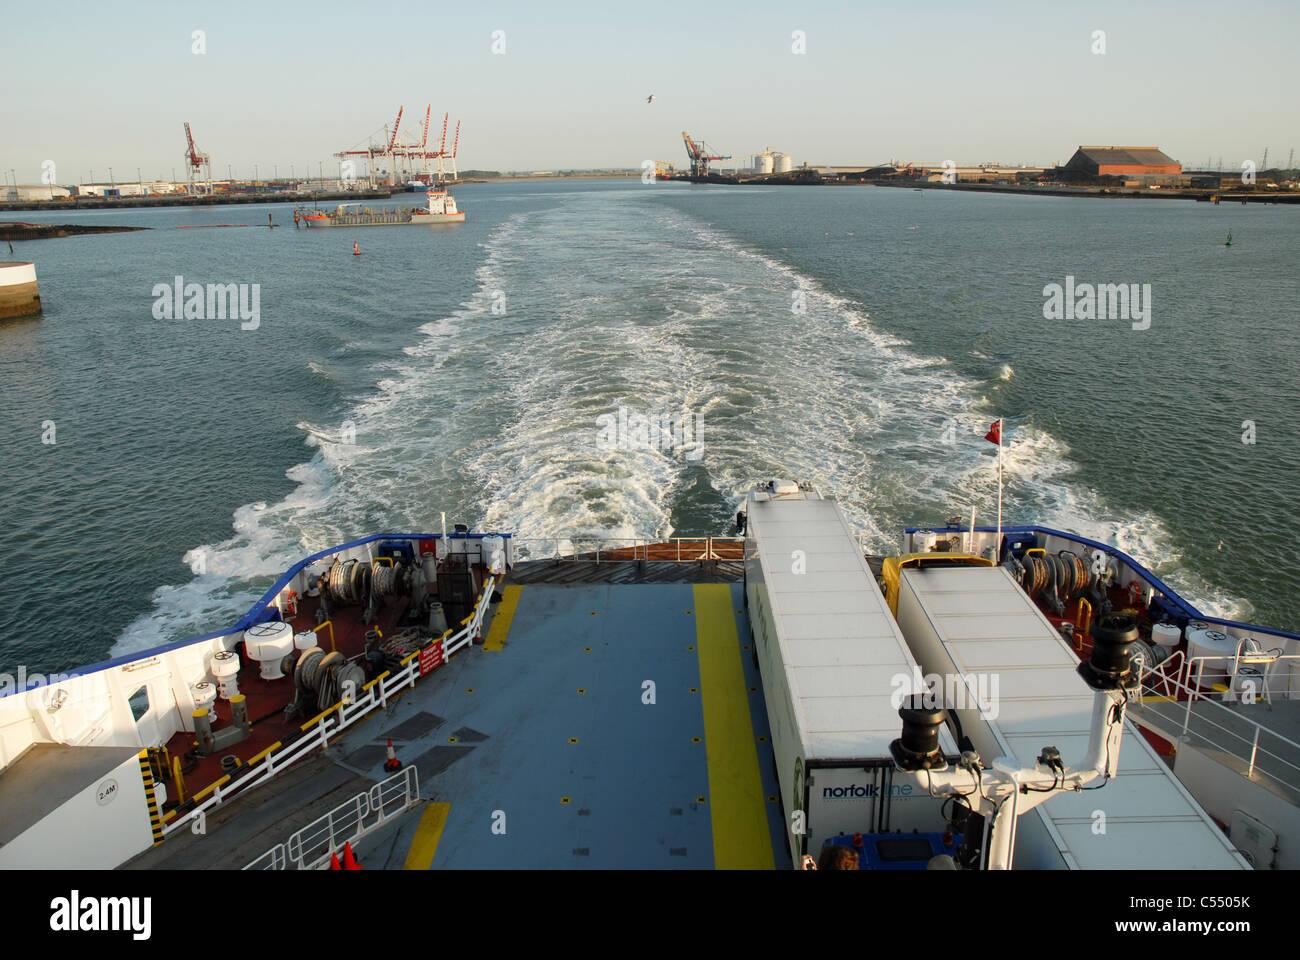 Port de dunkerque france stock photo royalty free image 37603935 alamy - Dunkirk port france address ...